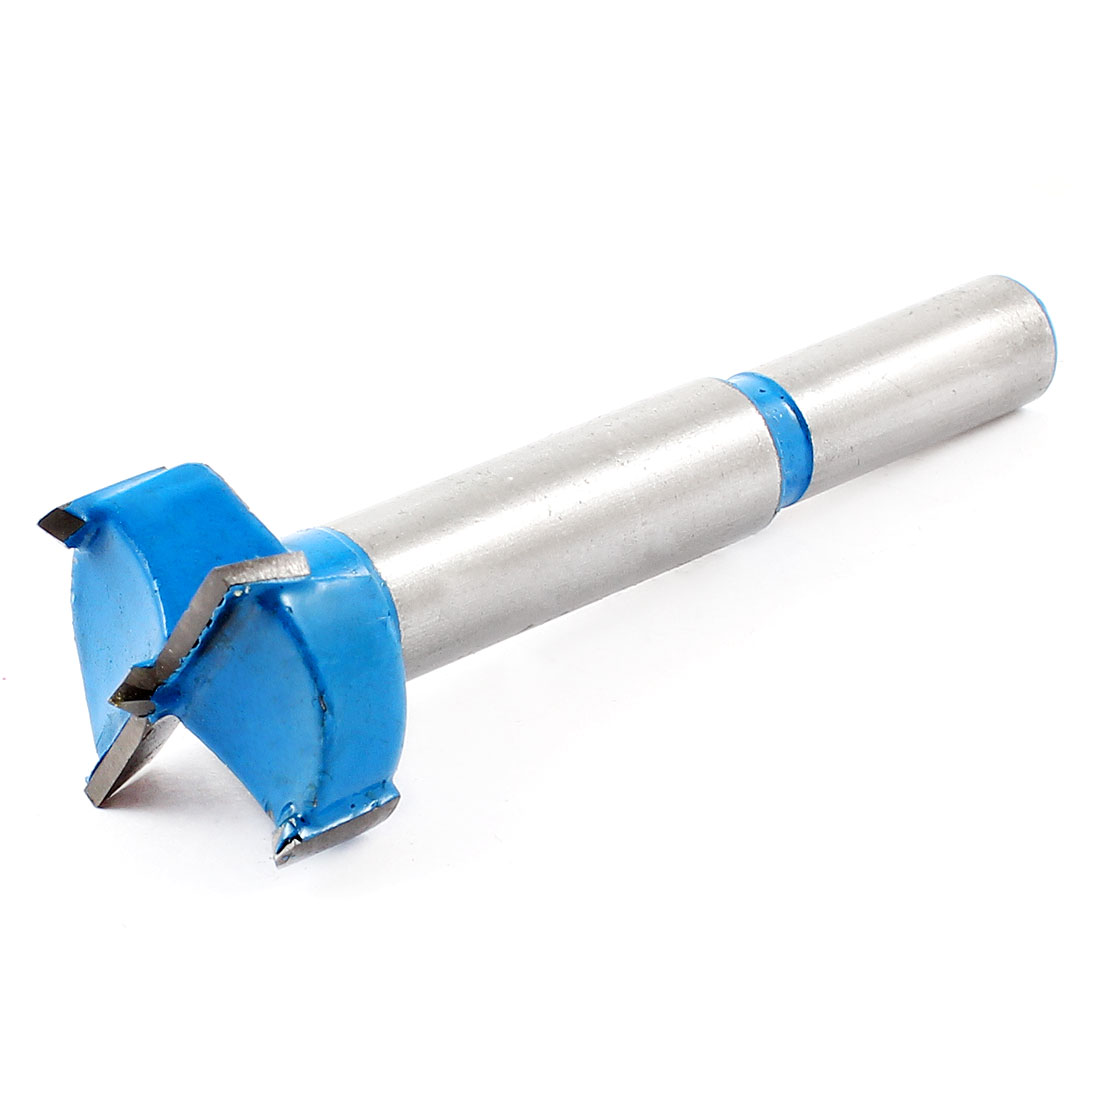 Carpenter Carbide Tipped 16mm Diameter Hinge Boring Bit Blue Silver Tone